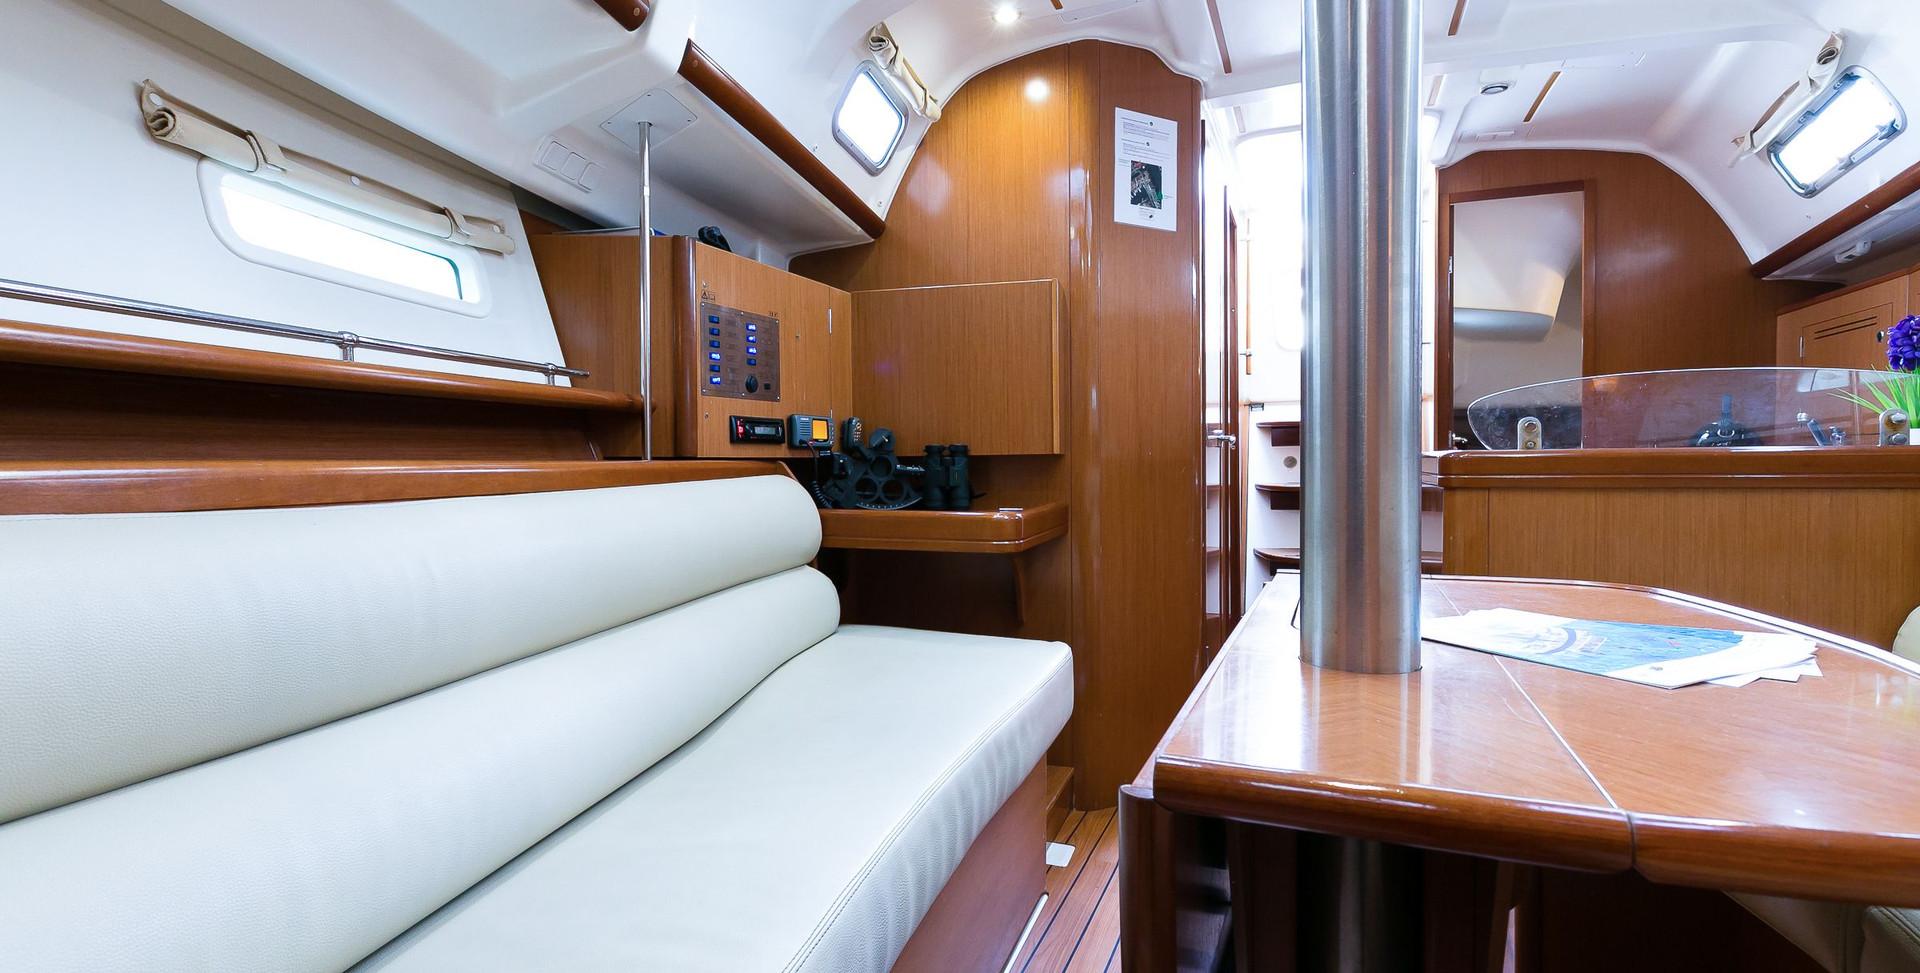 Teseris-interior-5.jpg